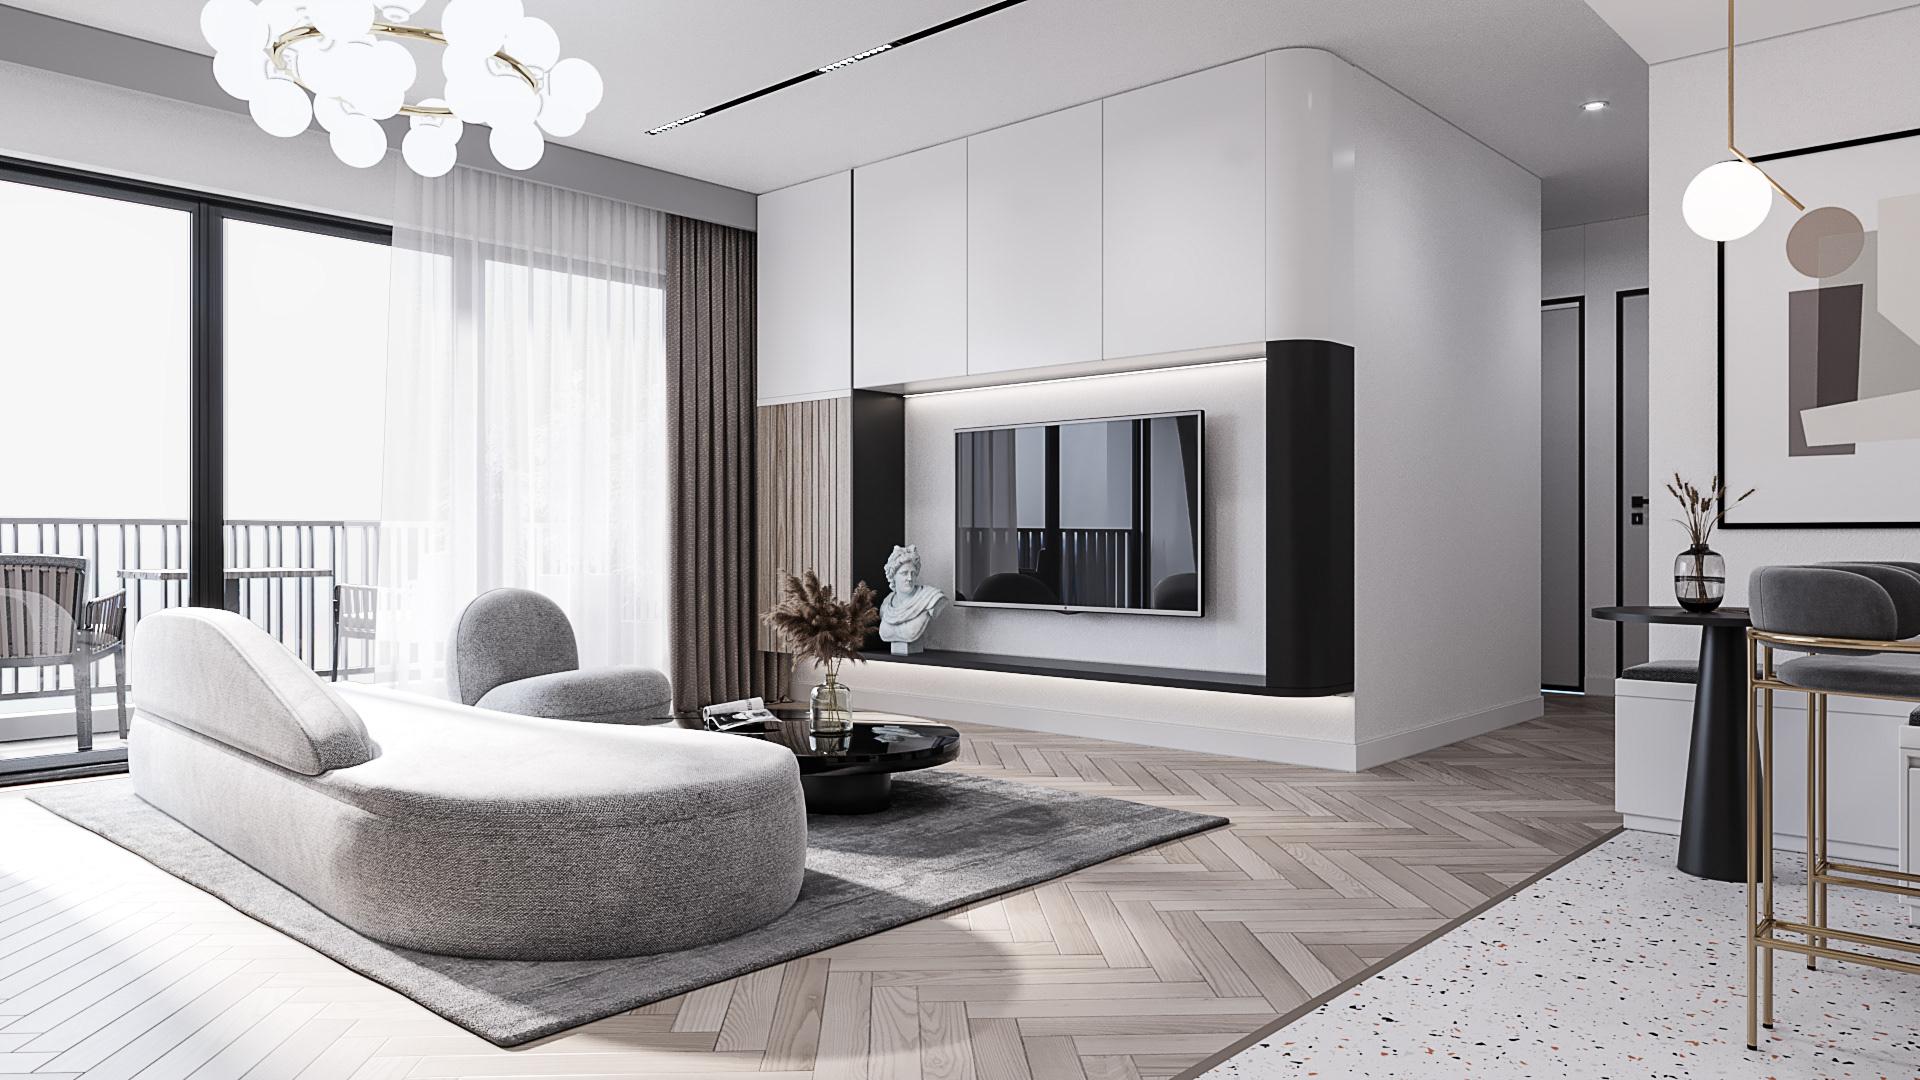 Thiết kế nội thất căn hộ Berriver Jardin